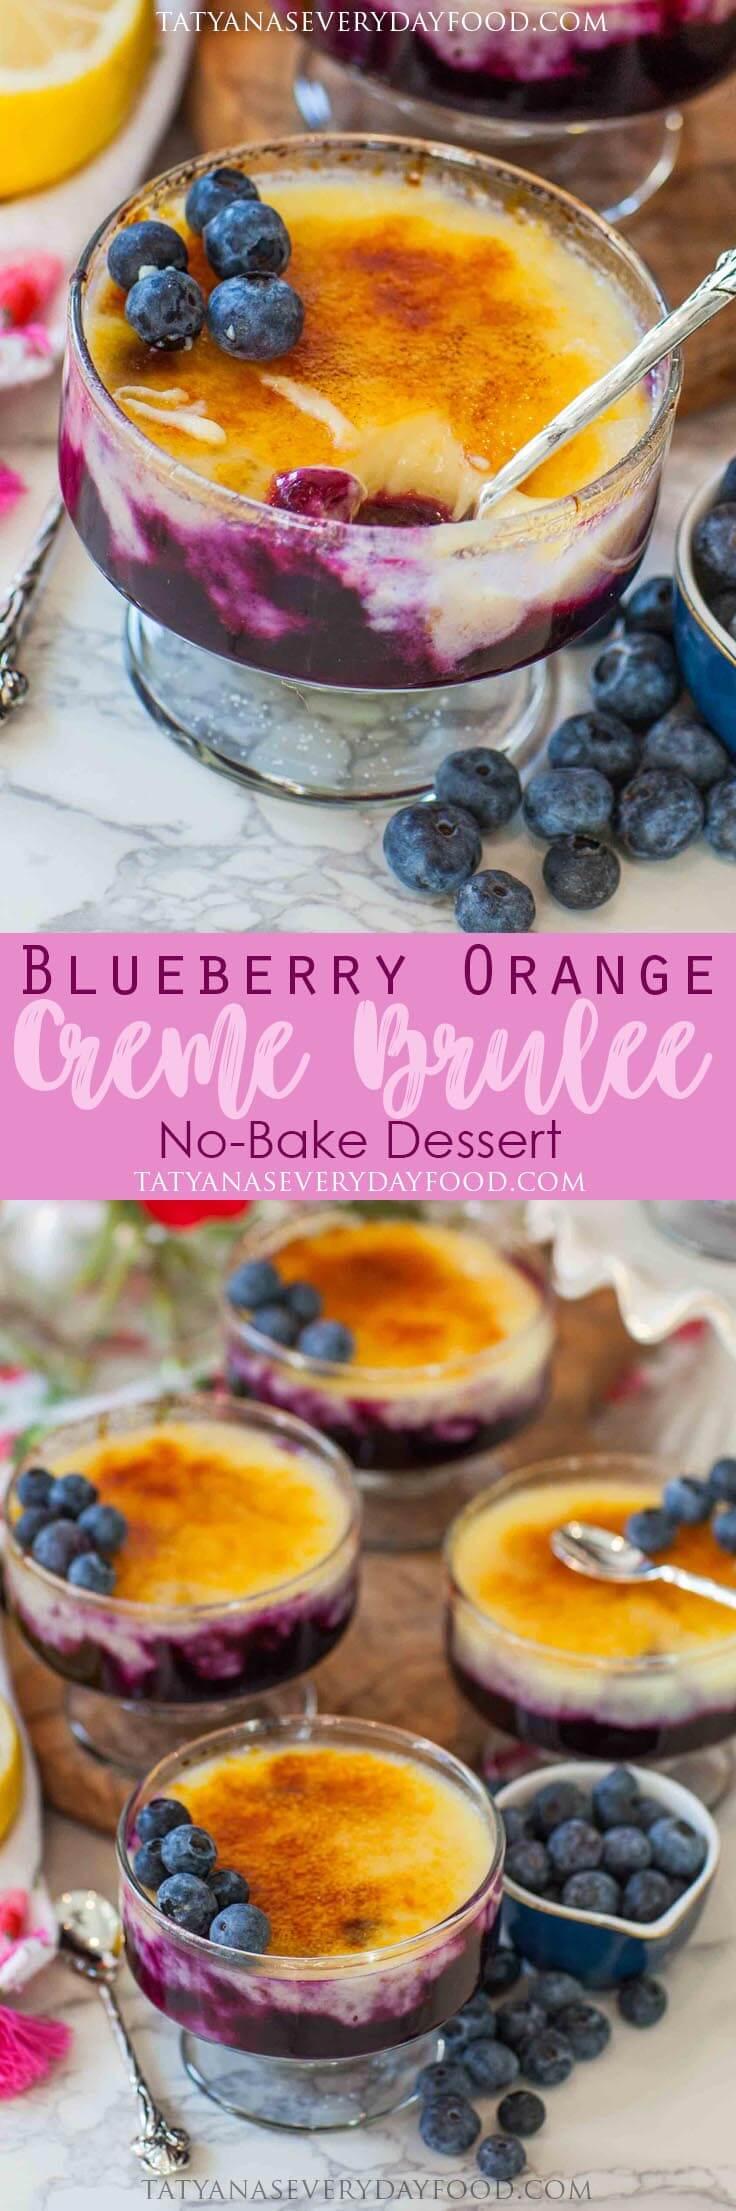 No-Bake Blueberry Orange Creme Brulee Recipe with video